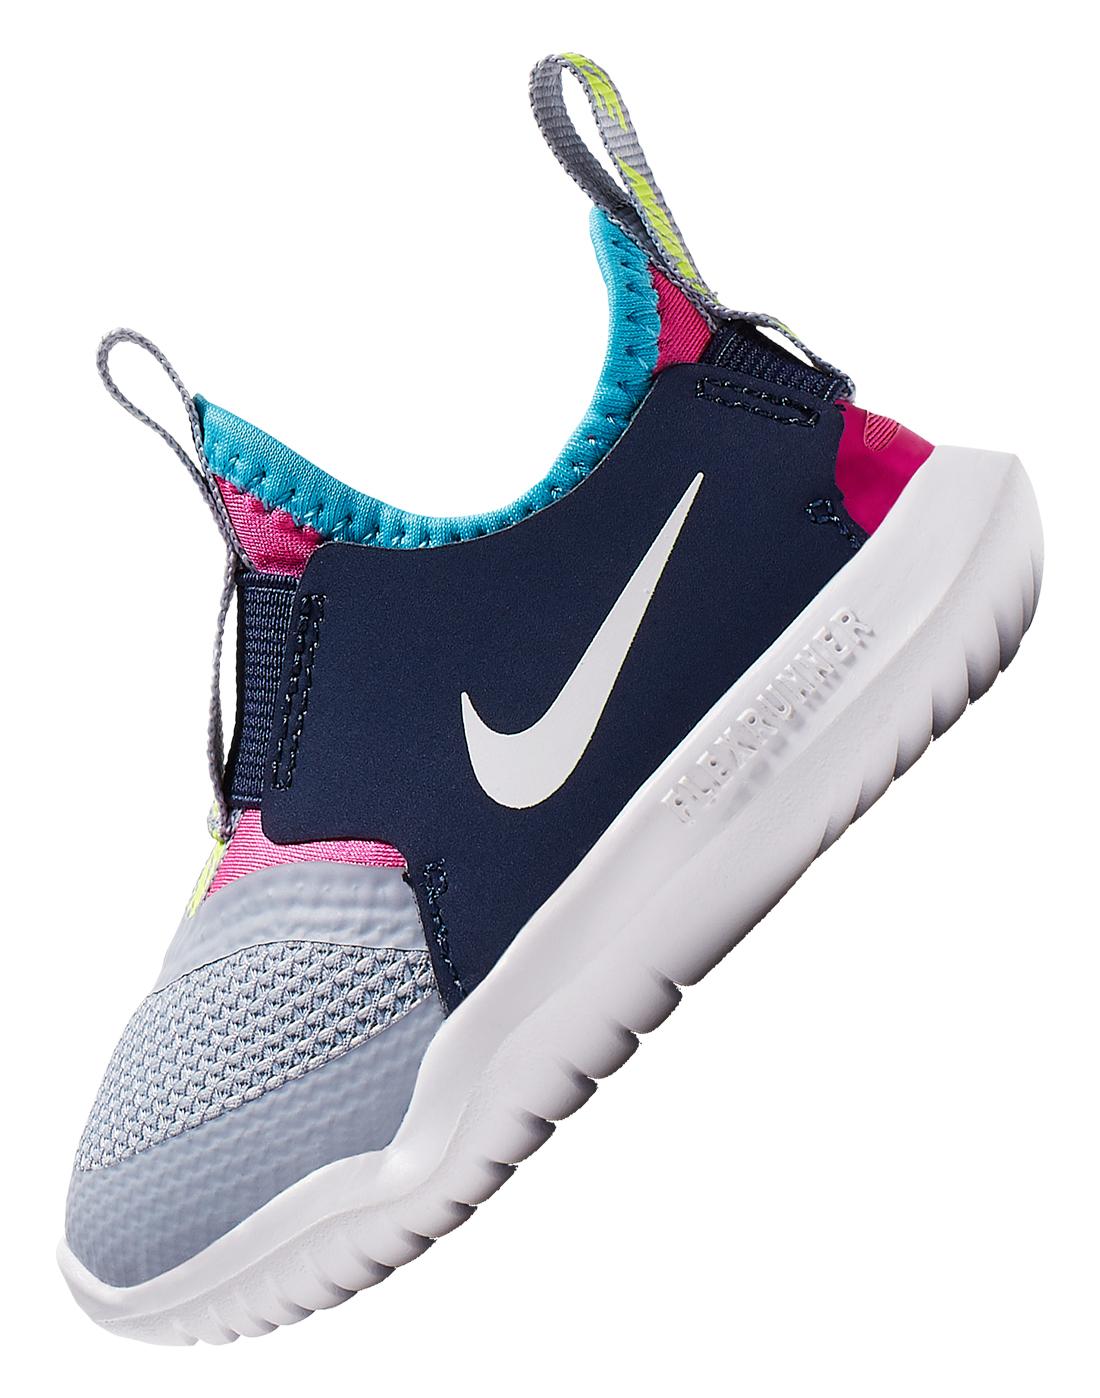 bdc14c08b2 Infant Boys Blue Nike Flex Runner | Life Style Sports